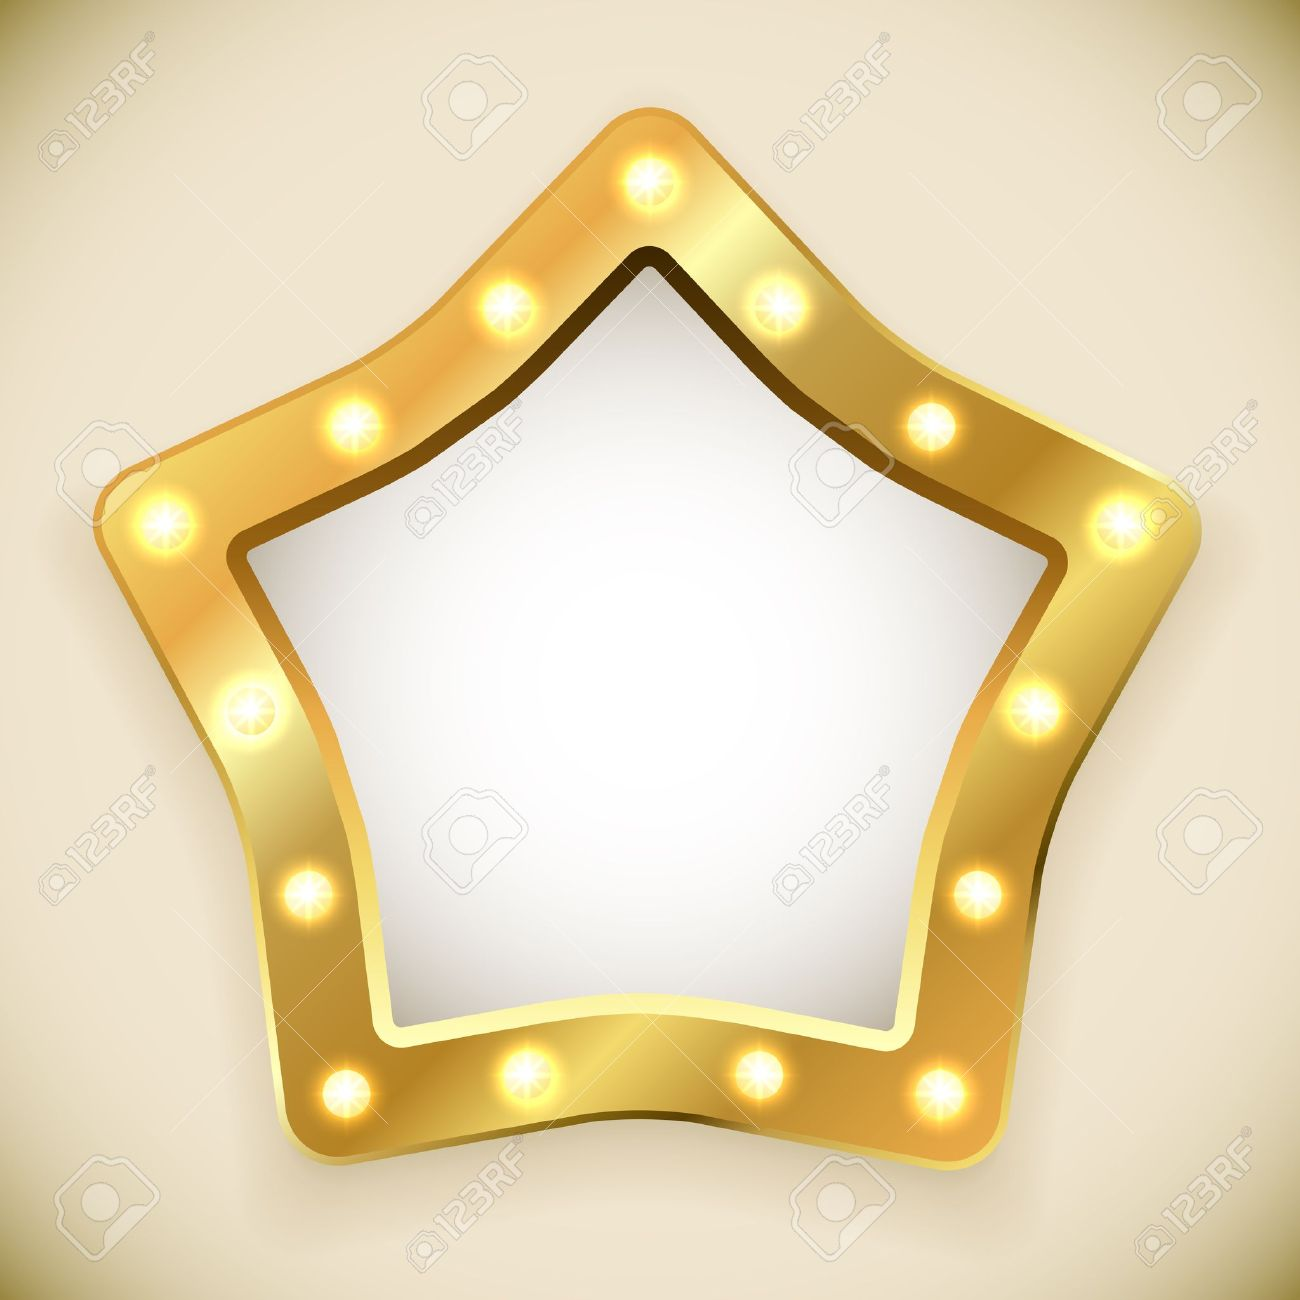 Blank golden star frame with light bulbs vector illustration Stock Vector - 21216118